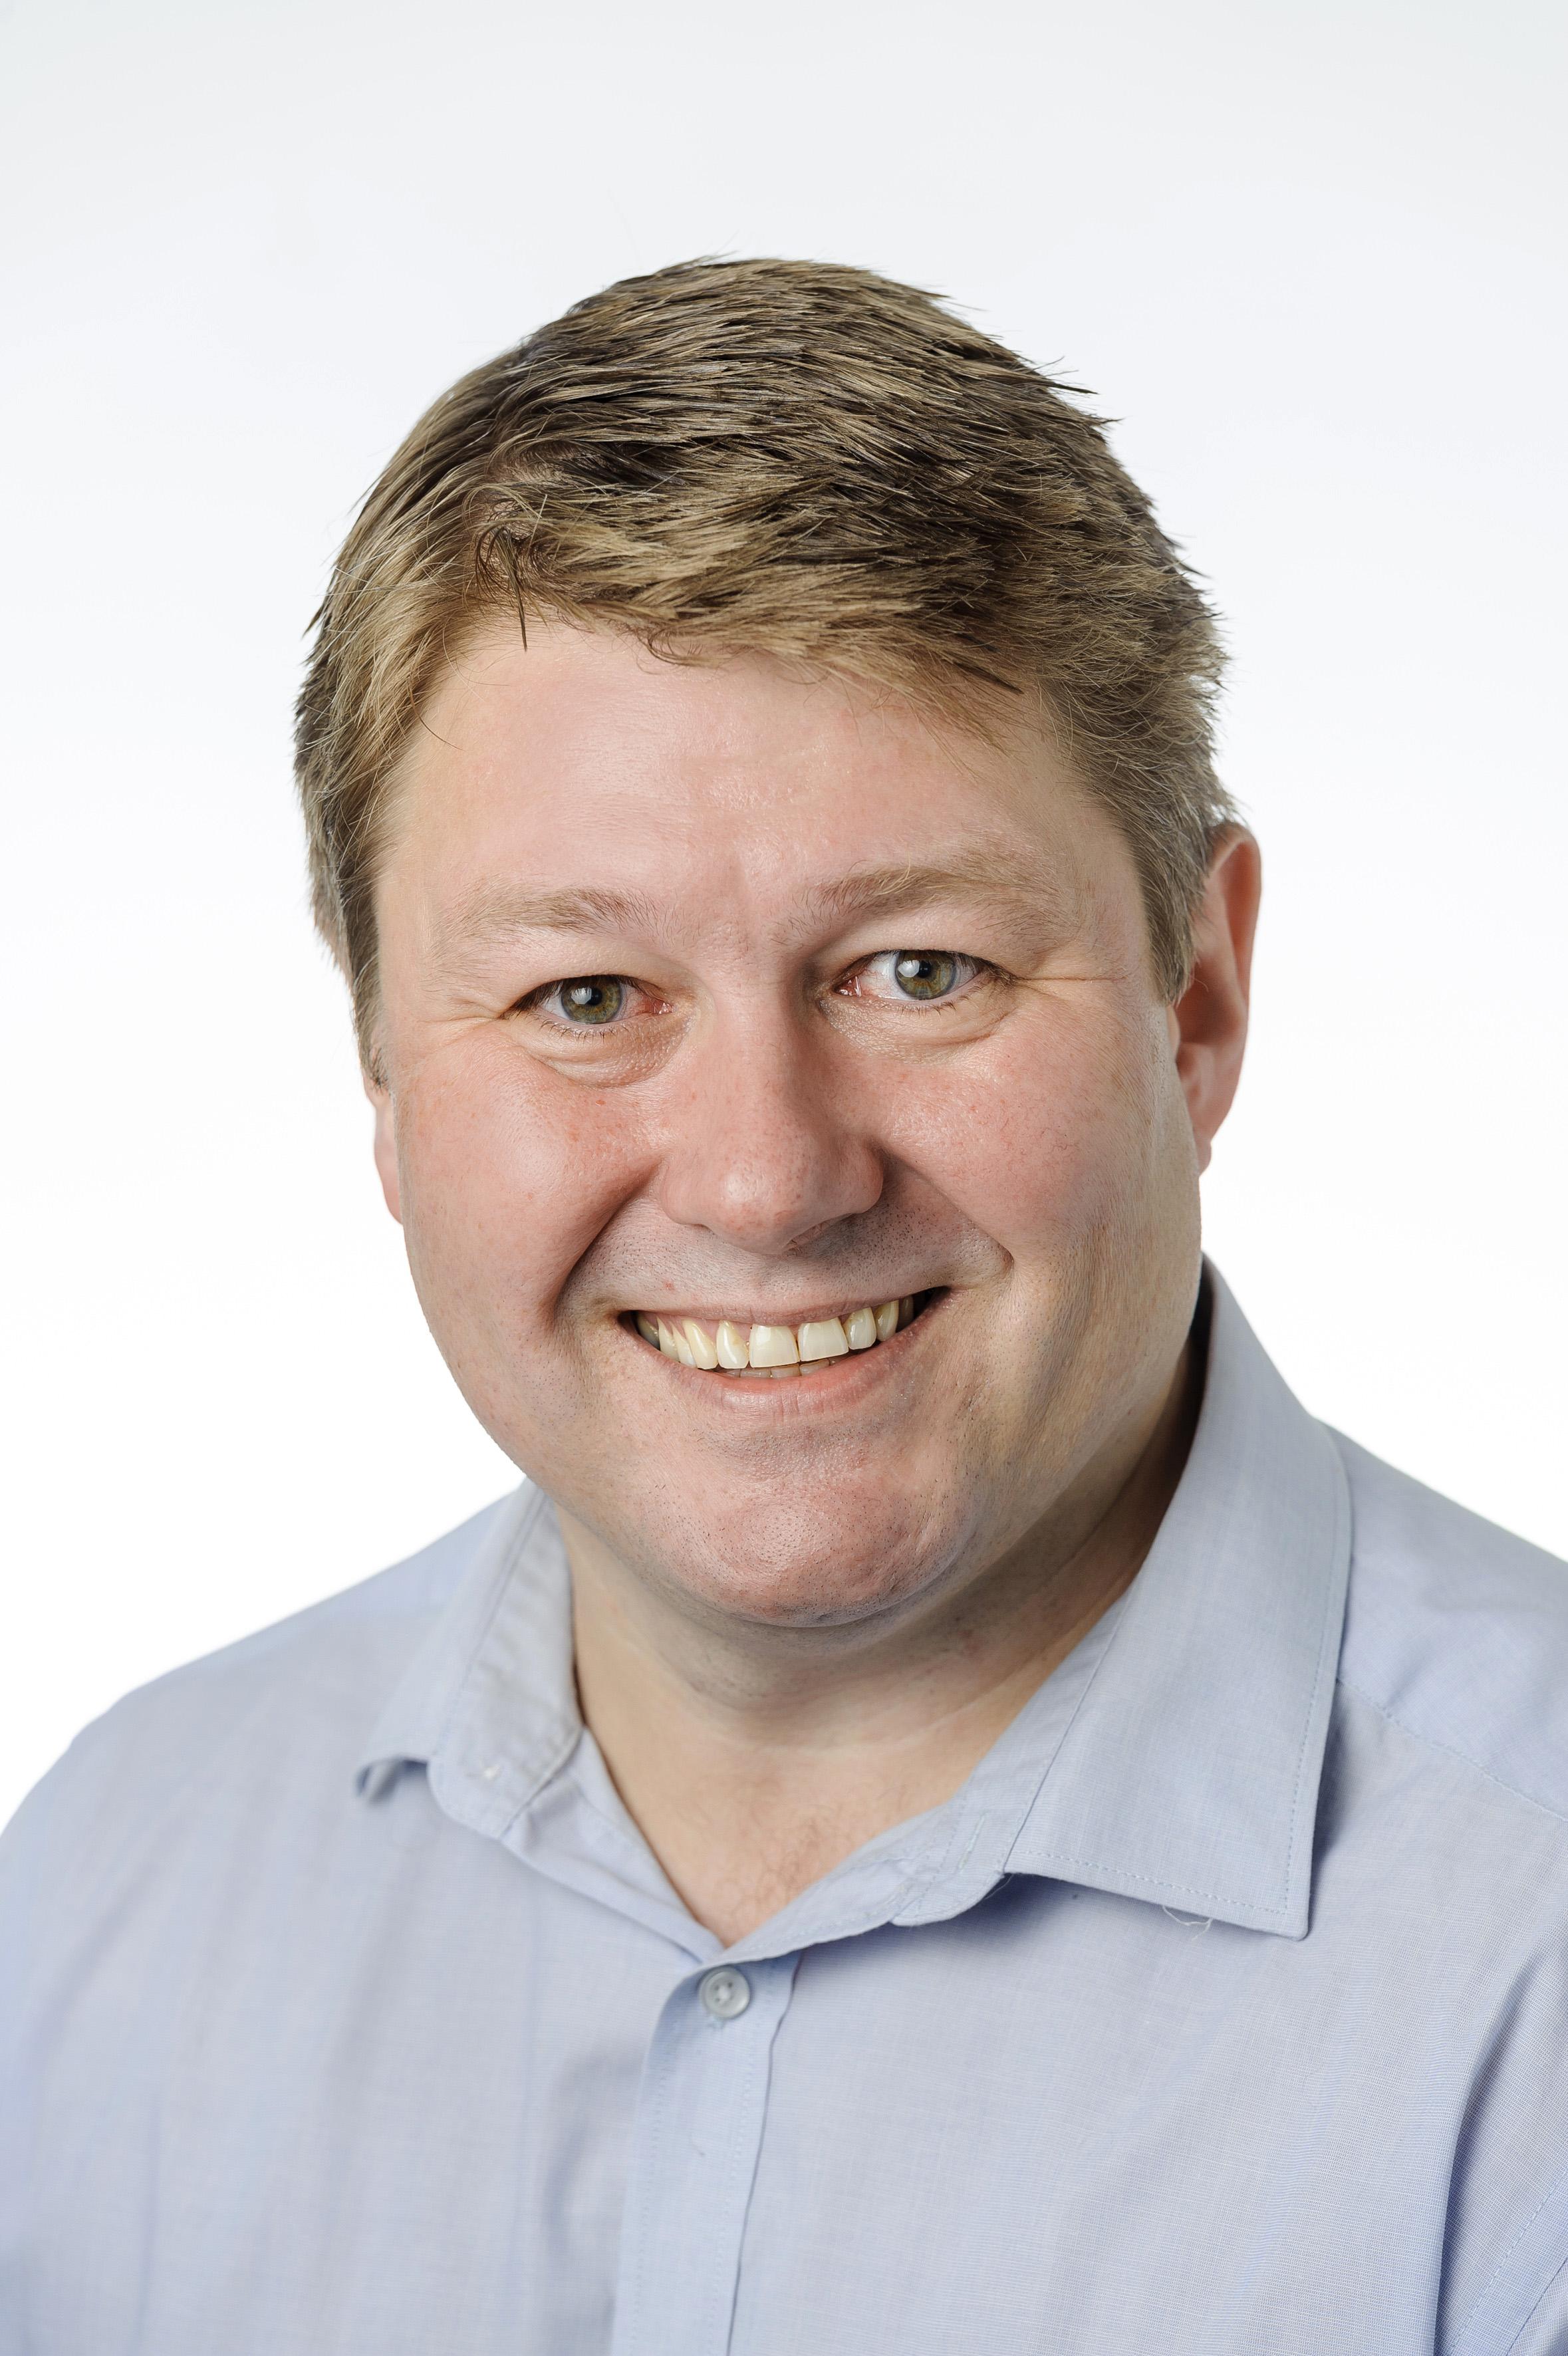 Ian Sefton